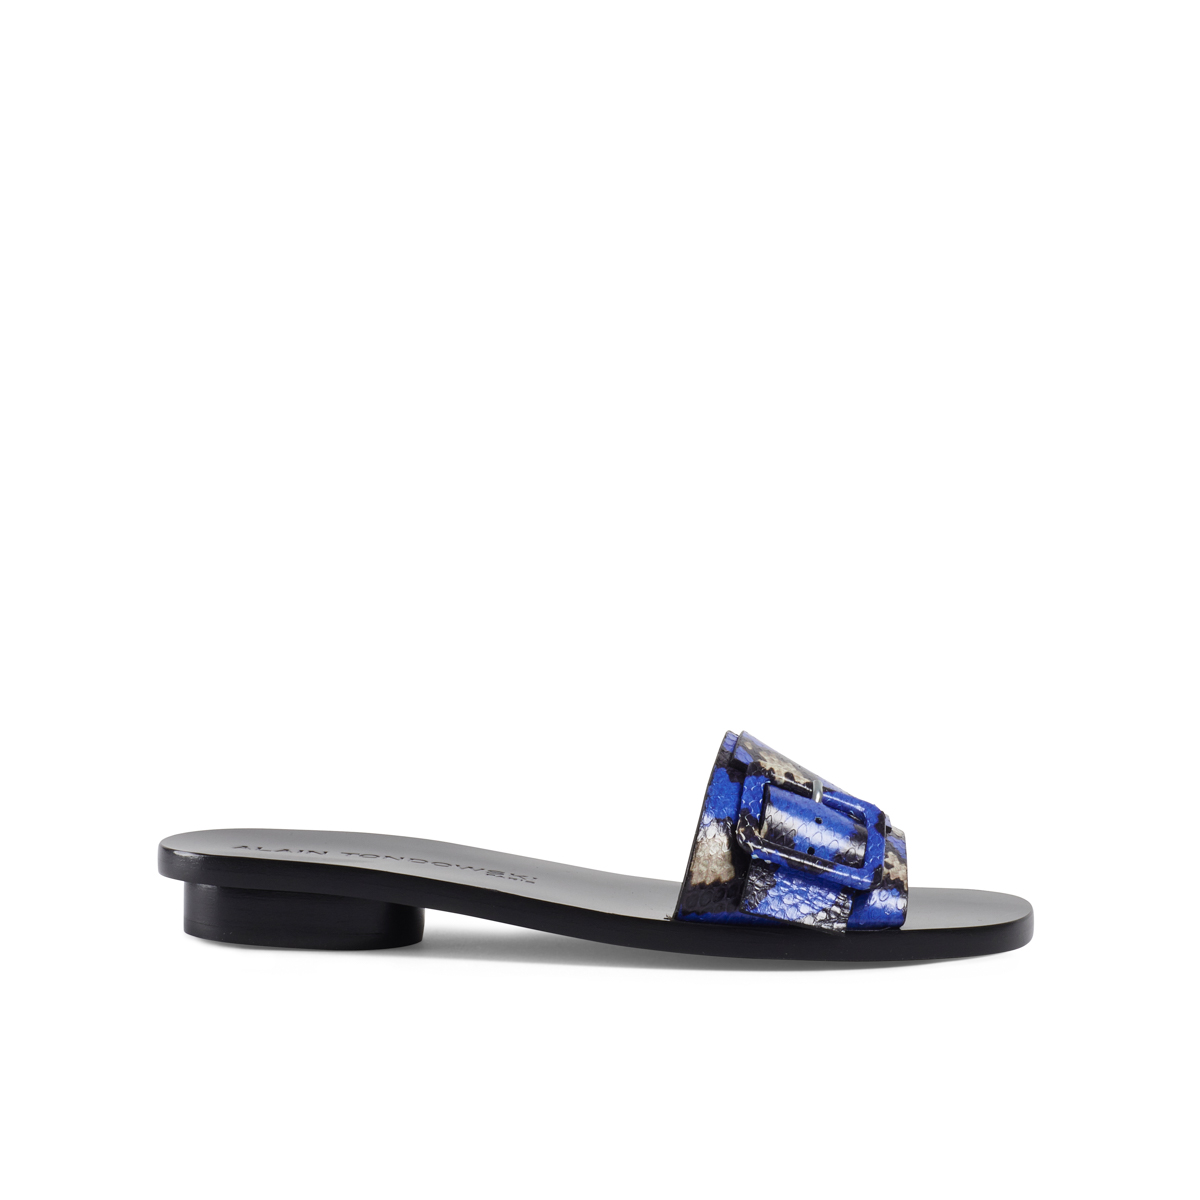 036_alaintondowski_springsummer2017_shoes_3012